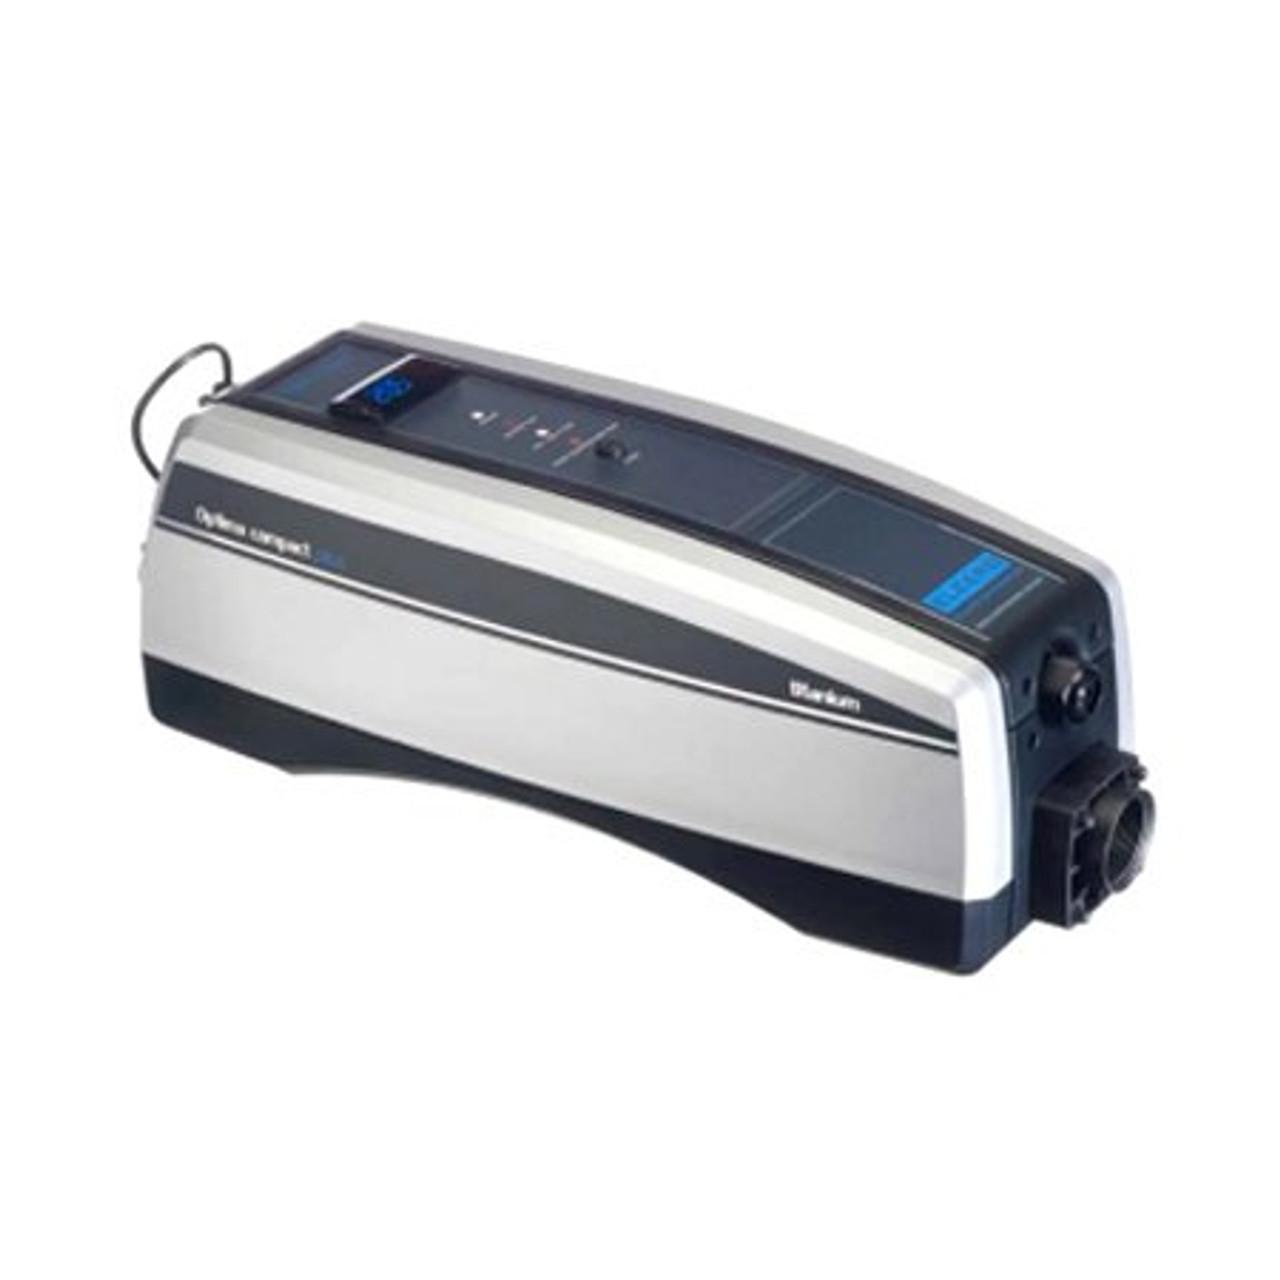 "Optima Titanium In Line Heater, 6kW,220V 1 Phase, 27 Amps, 23"" X 6"" X 8.5"" (HTIO-6-220"